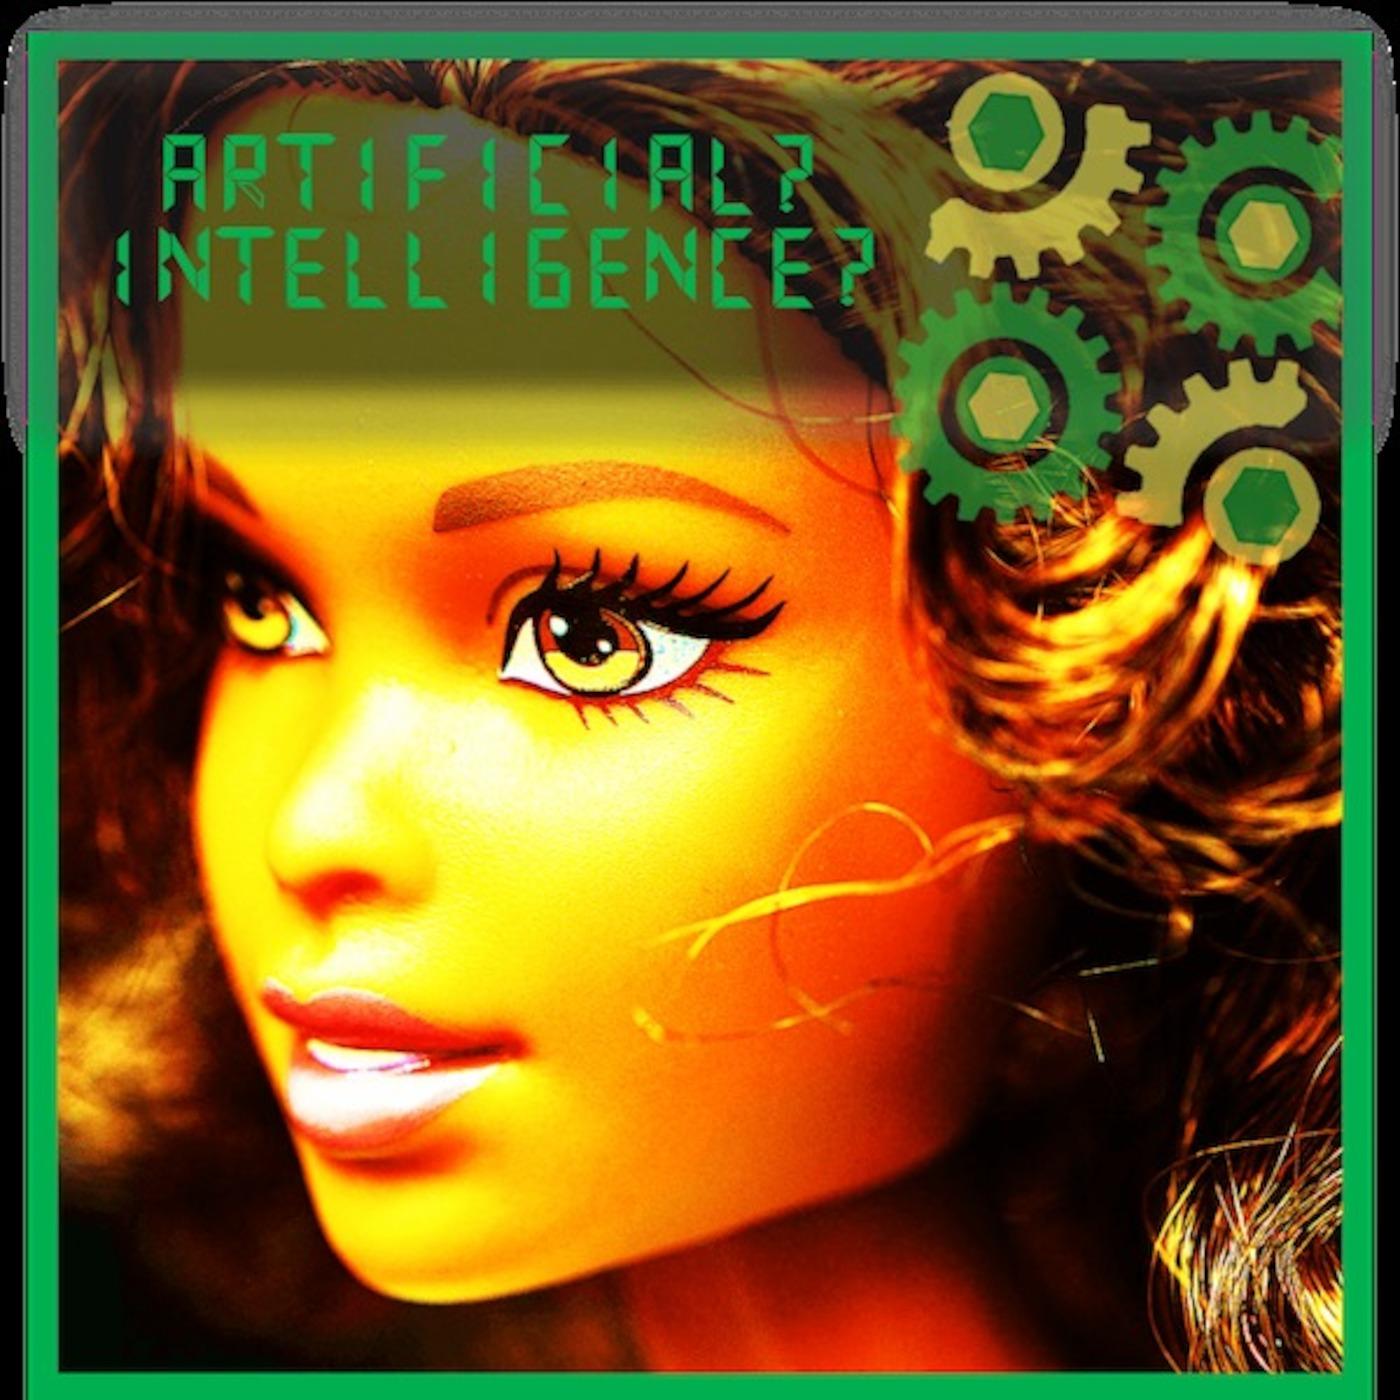 5: Digital Darwinism, AI Evolves Beyond Humans